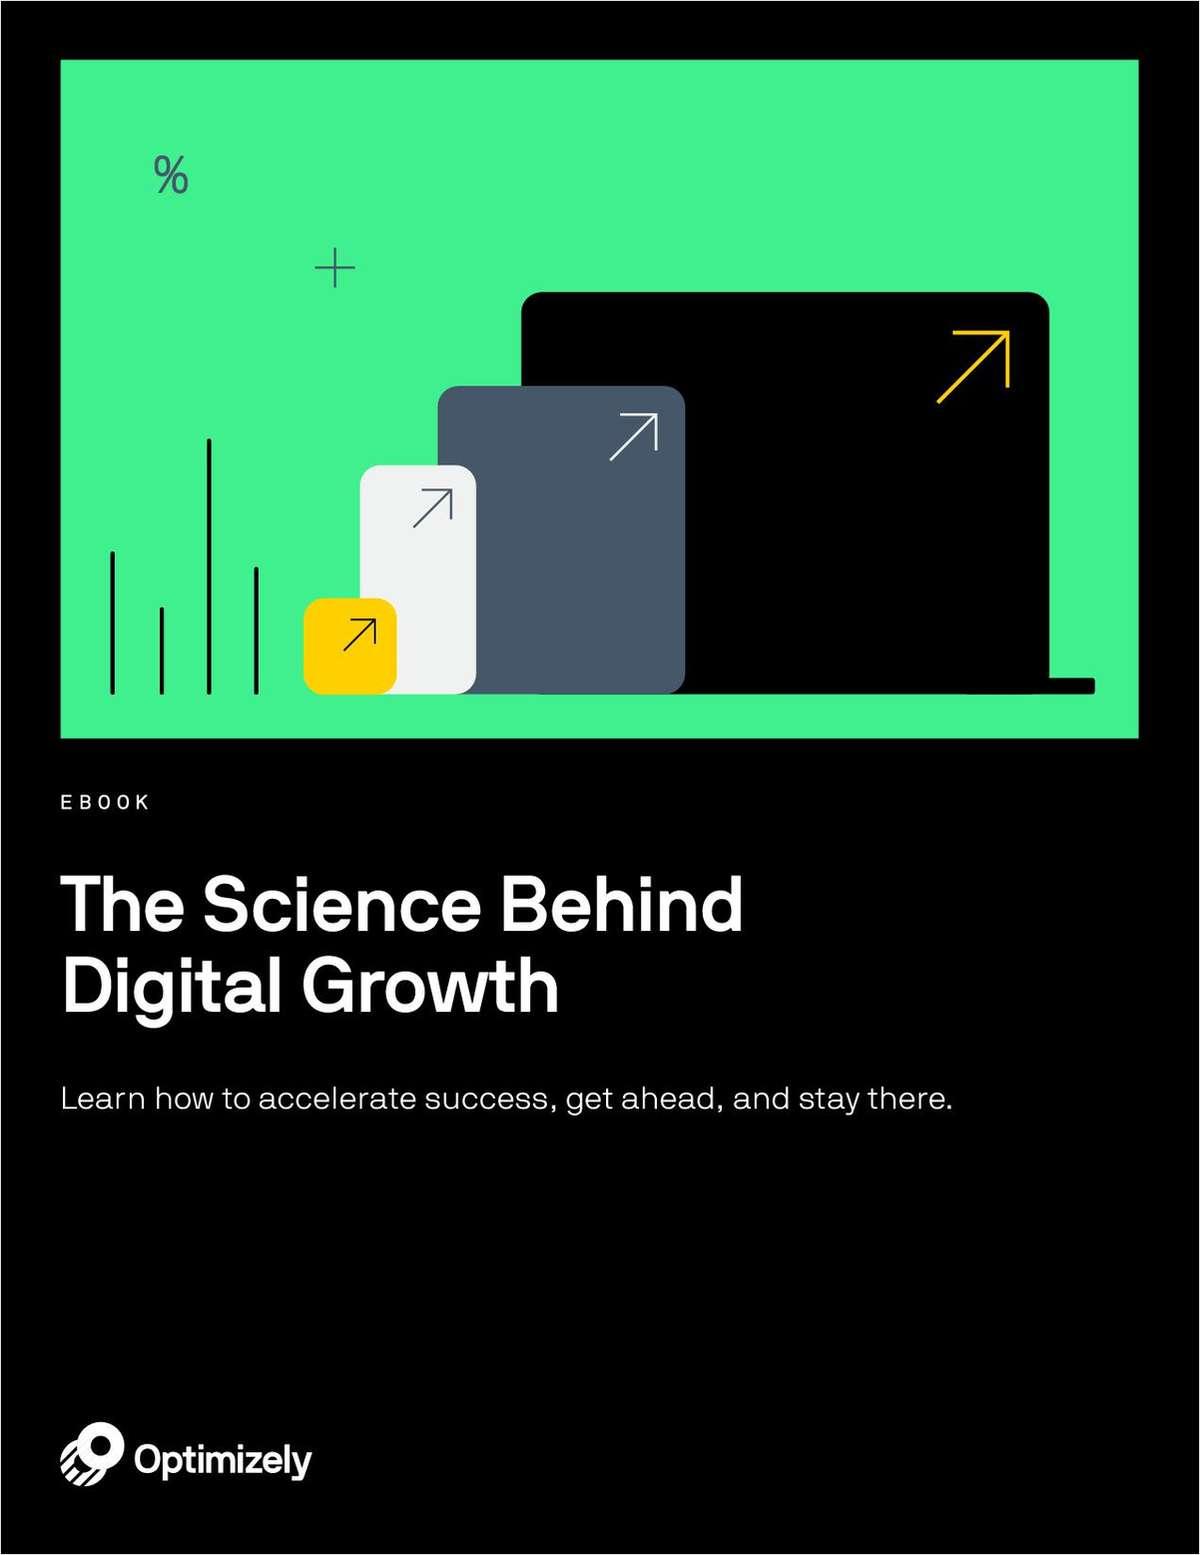 The Science Behind Digital Growth